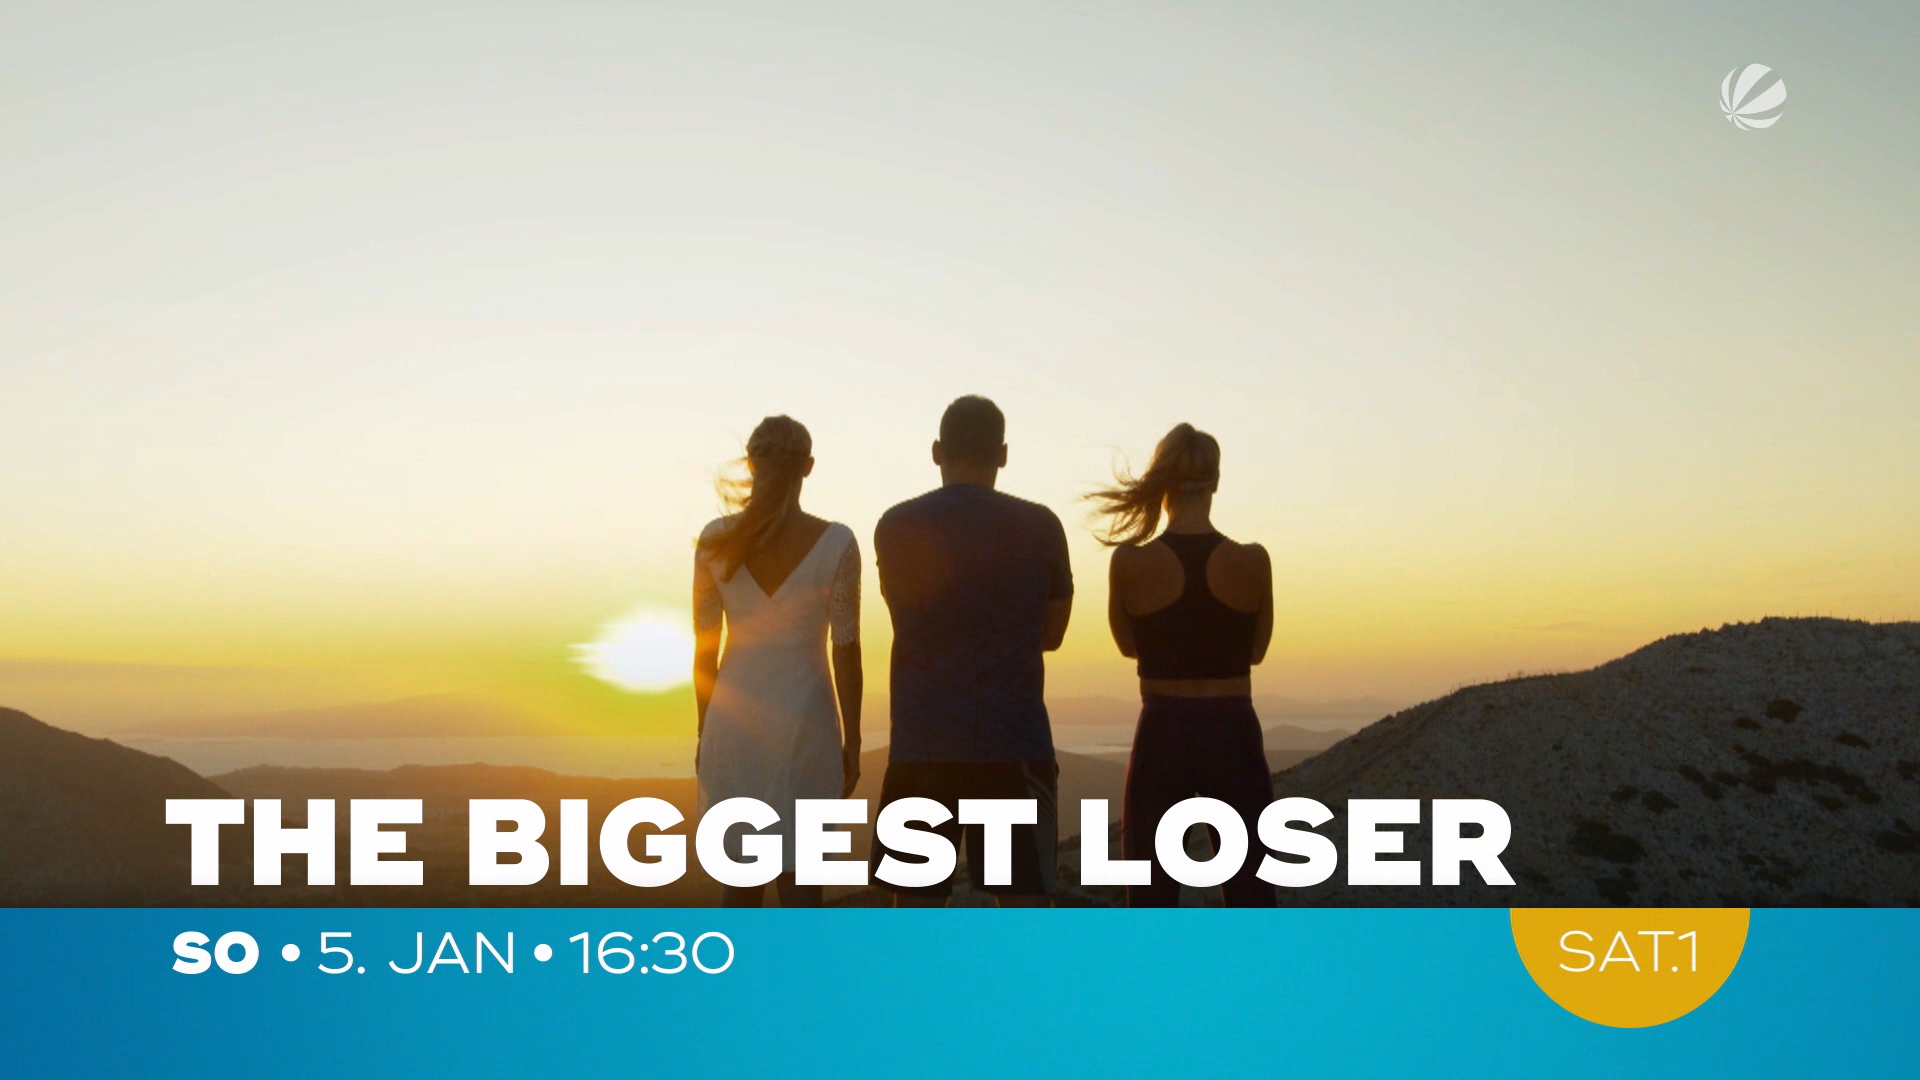 Sat.1 The Biggest Loser 2021 Ankündigungstrailer